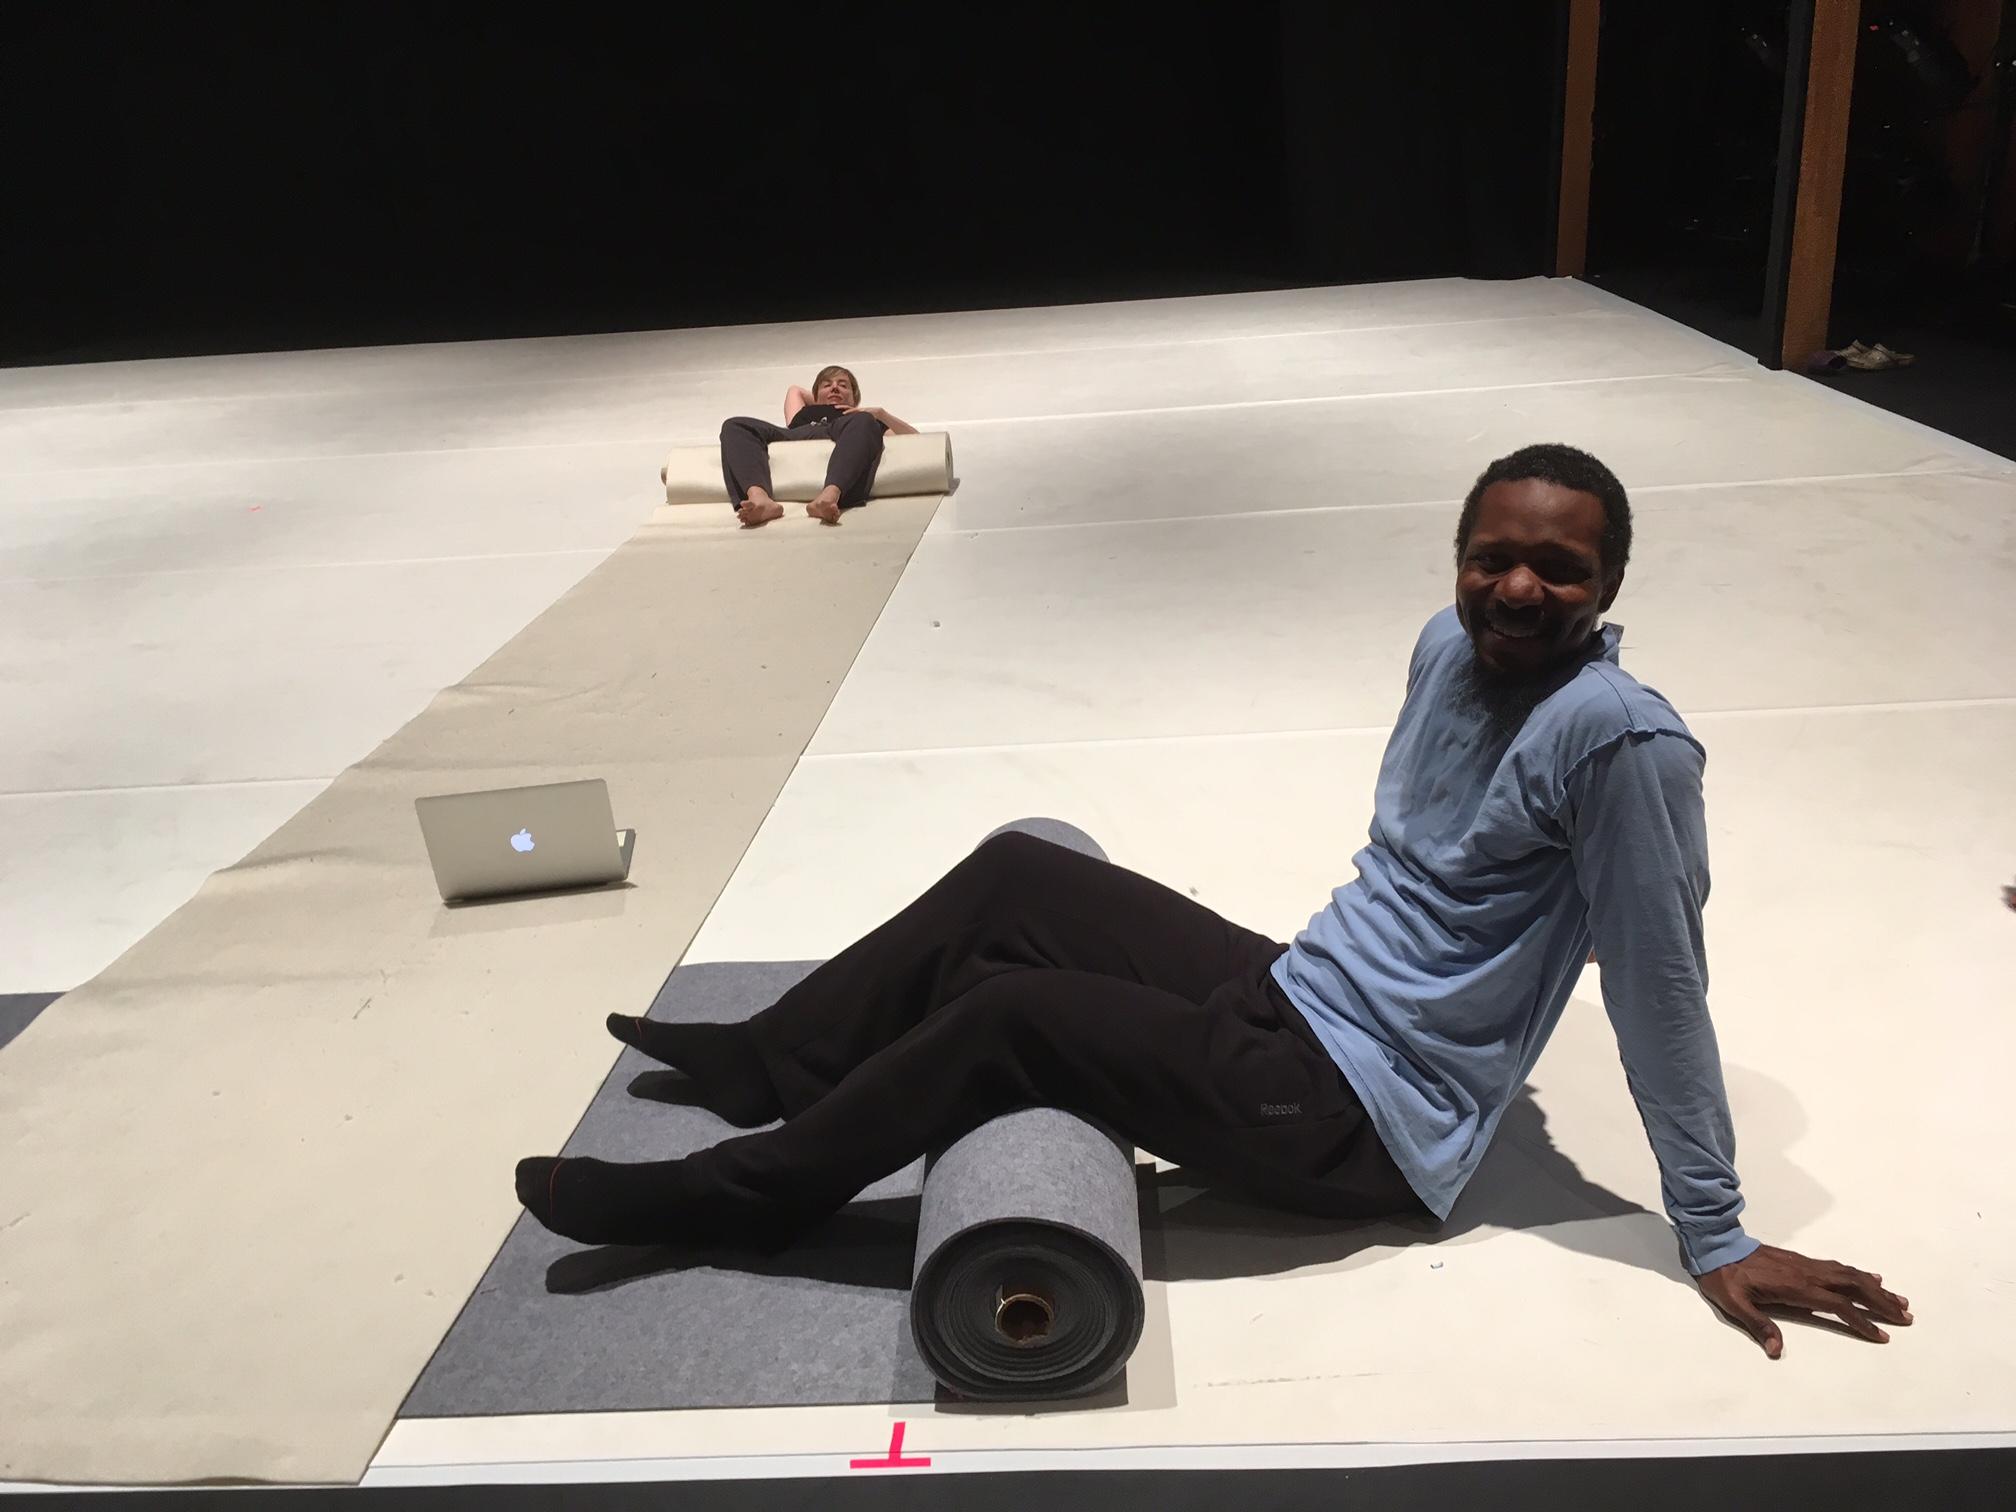 Trebien at the Jacob's Pillow rehearsal residency. Photo: Lila Hurwitz